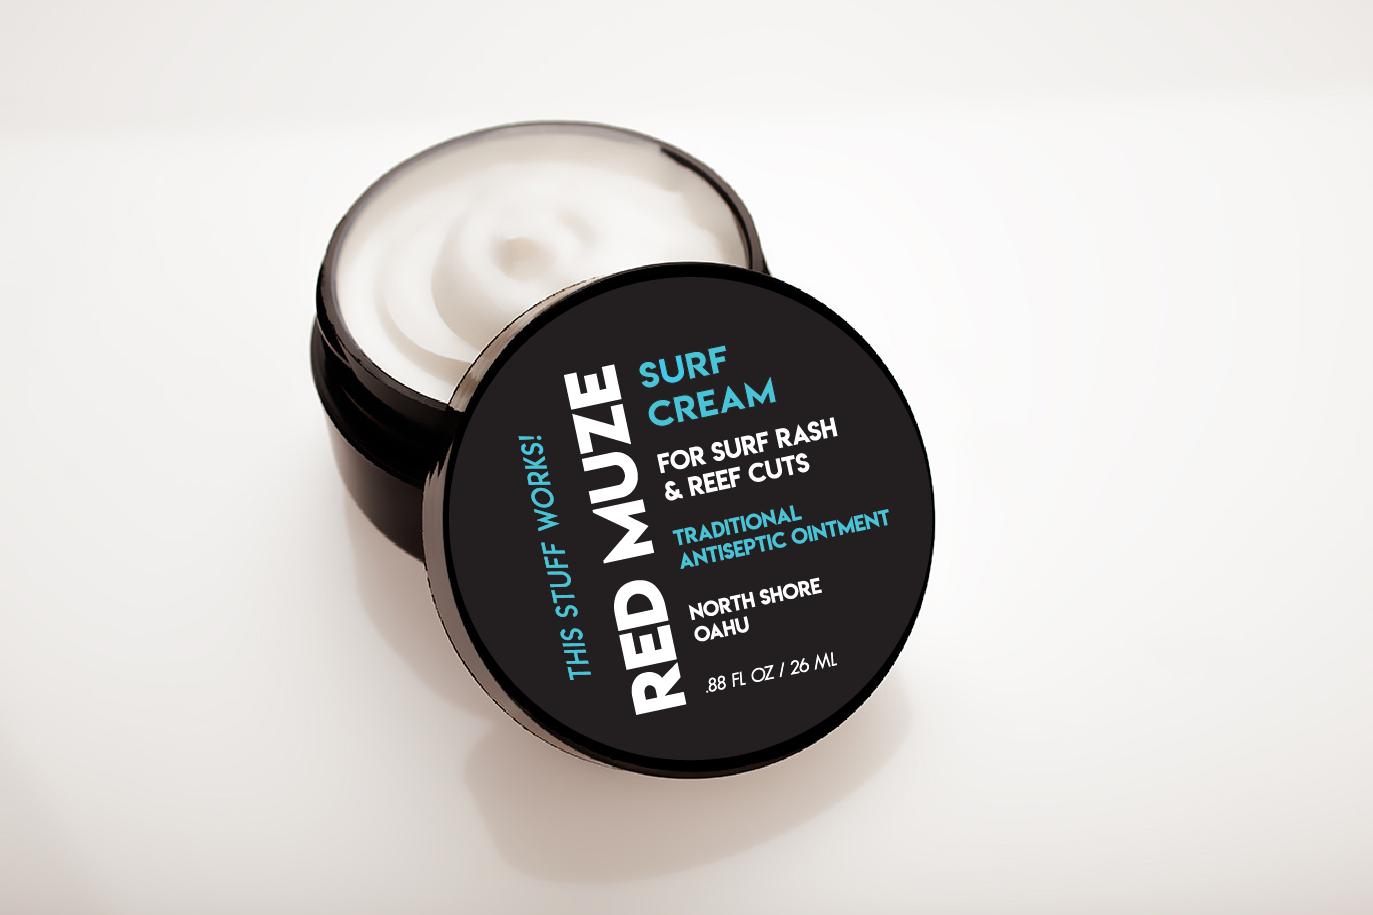 Red Muze New label-Jar for website.png